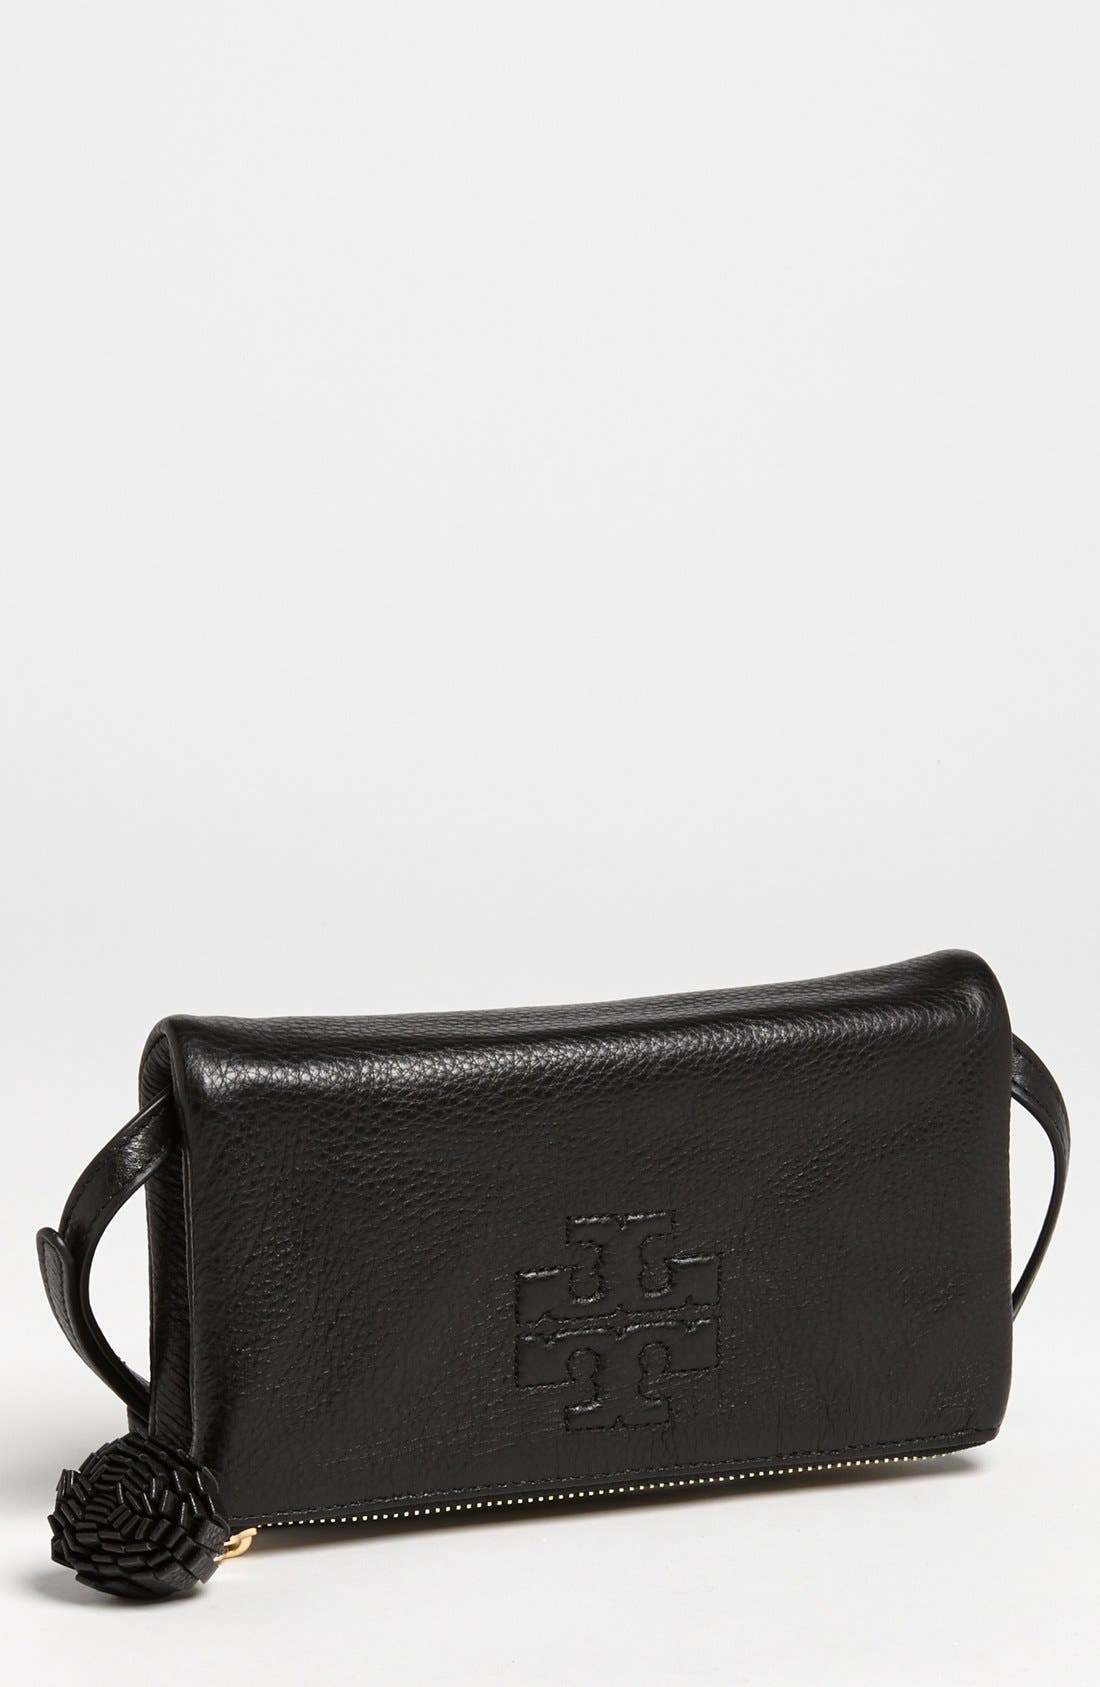 Main Image - Tory Burch 'Thea' Foldover Crossbody Bag